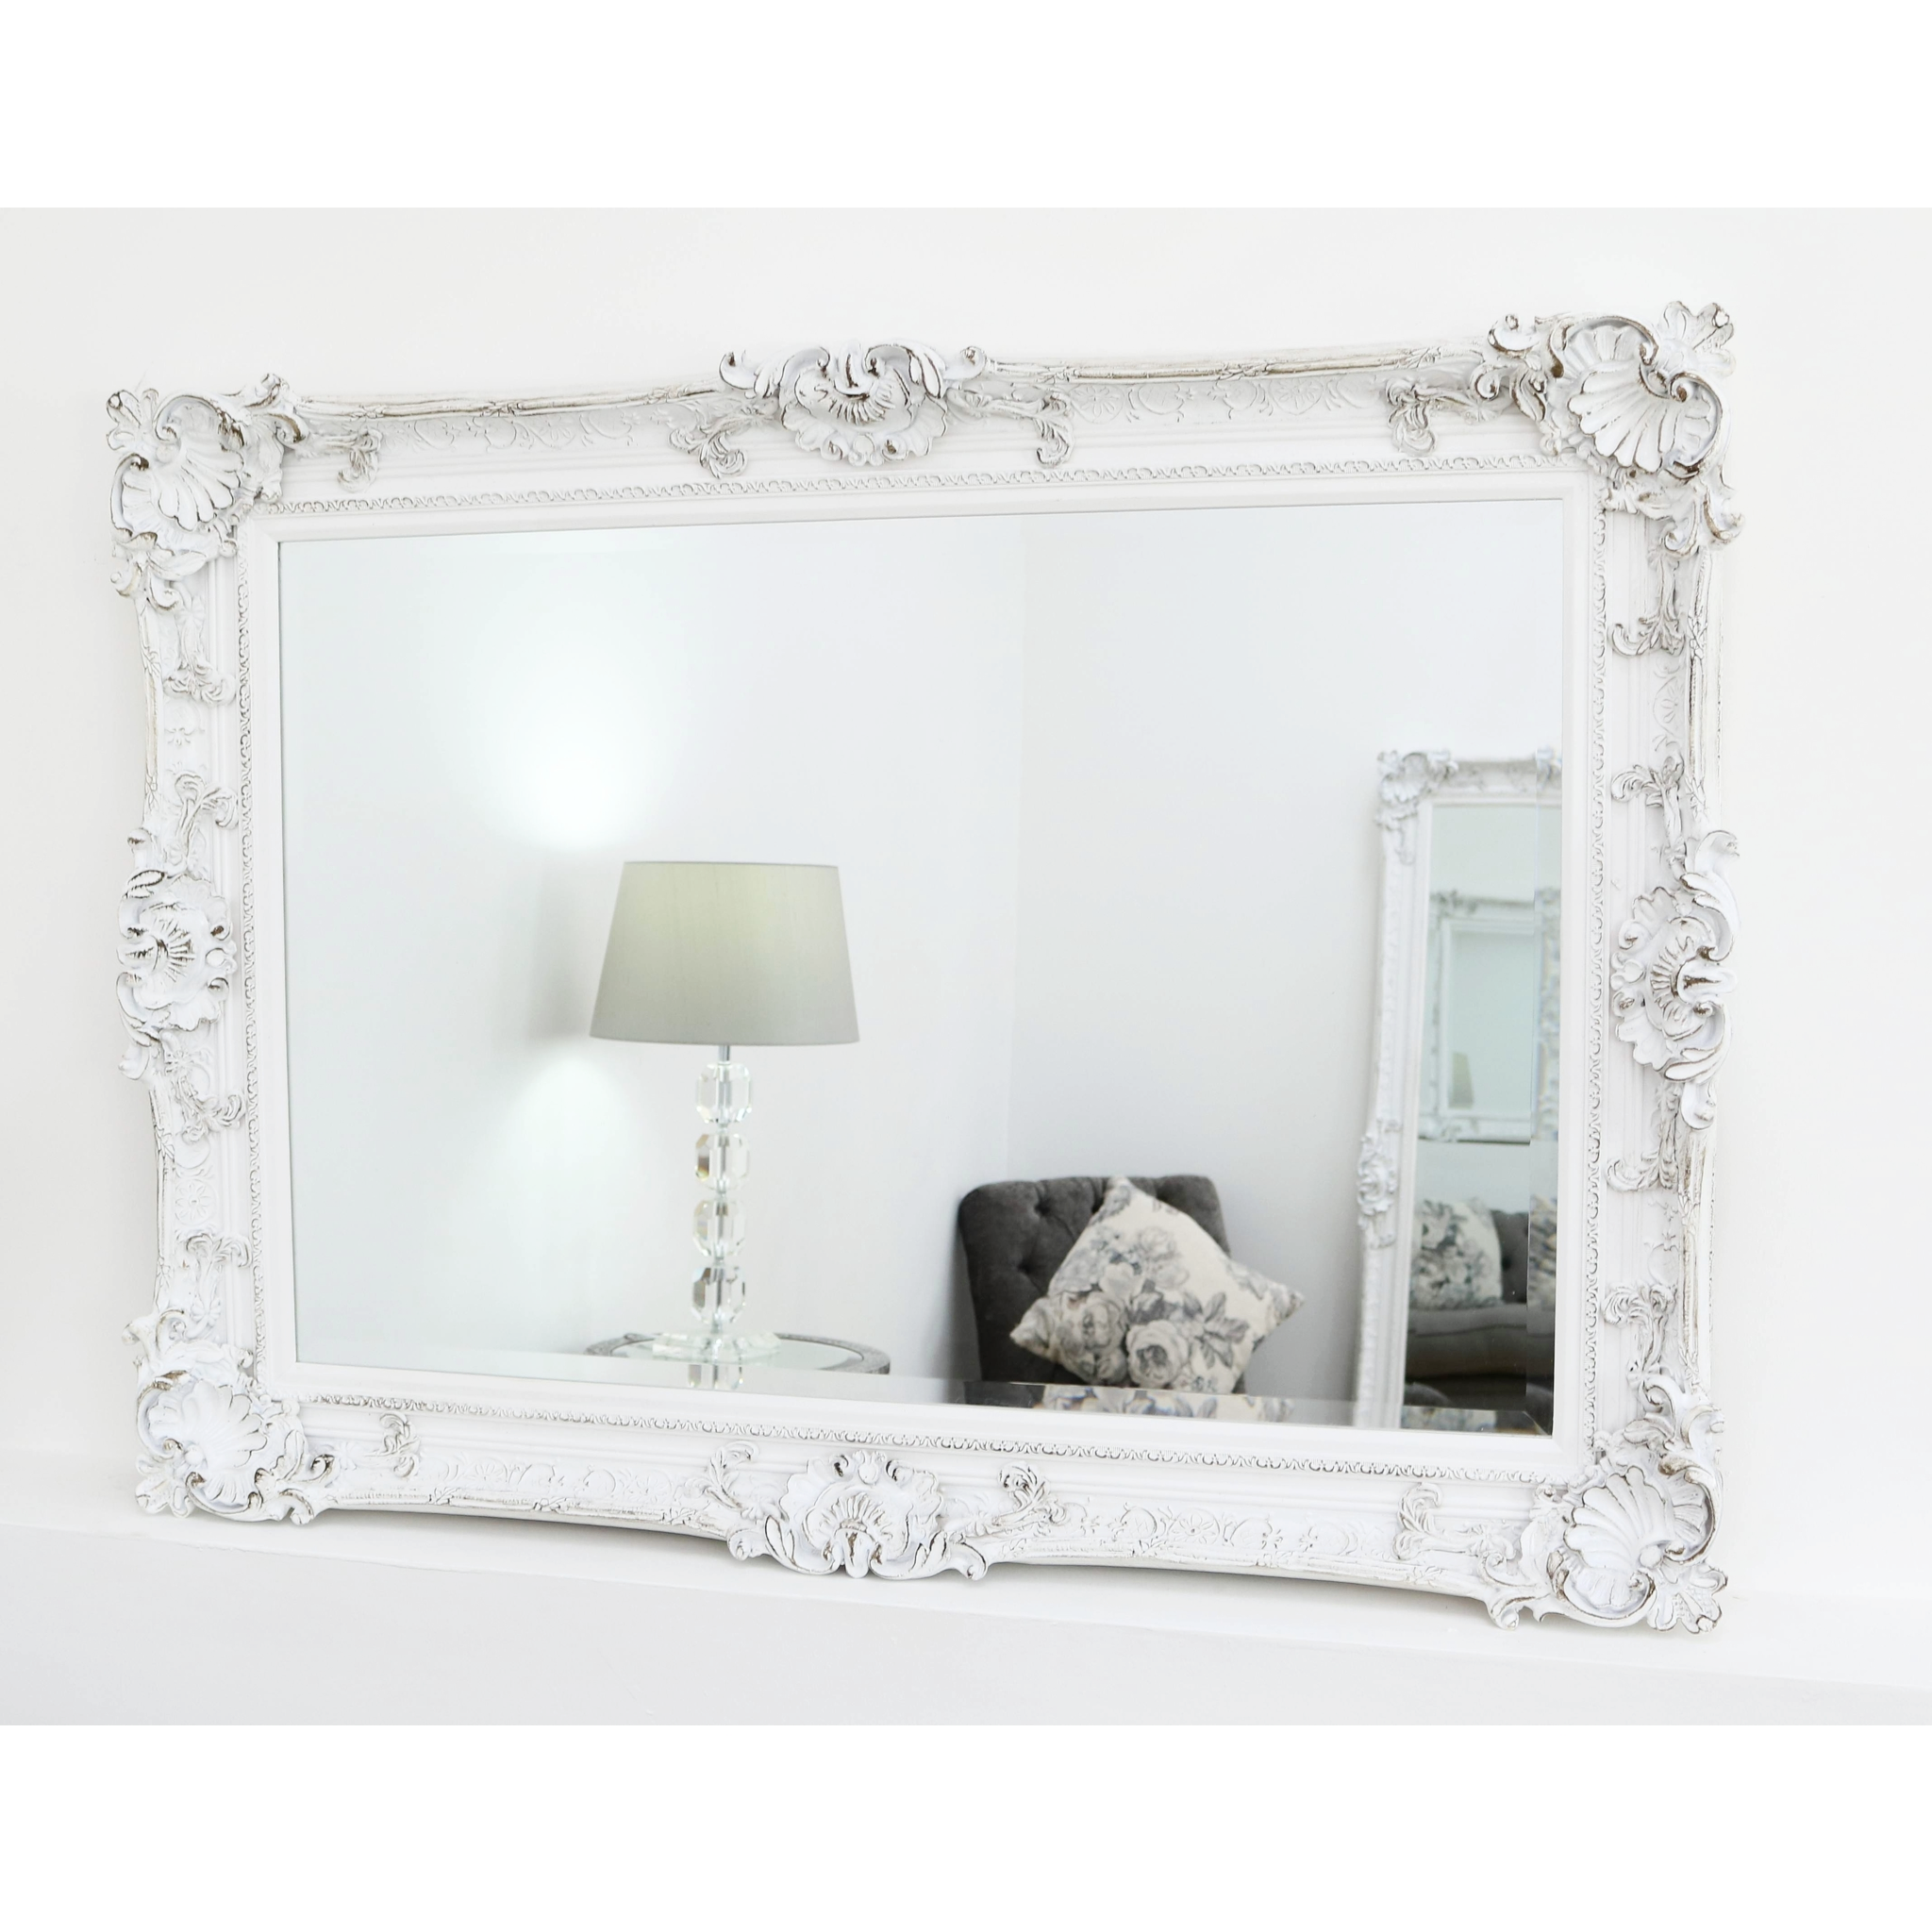 Hampshire White Ornate Rectangular Mirror 44 X 32 112cm X 81cm White Mirror Frame Ornate Mirror Antique Mirror Wall